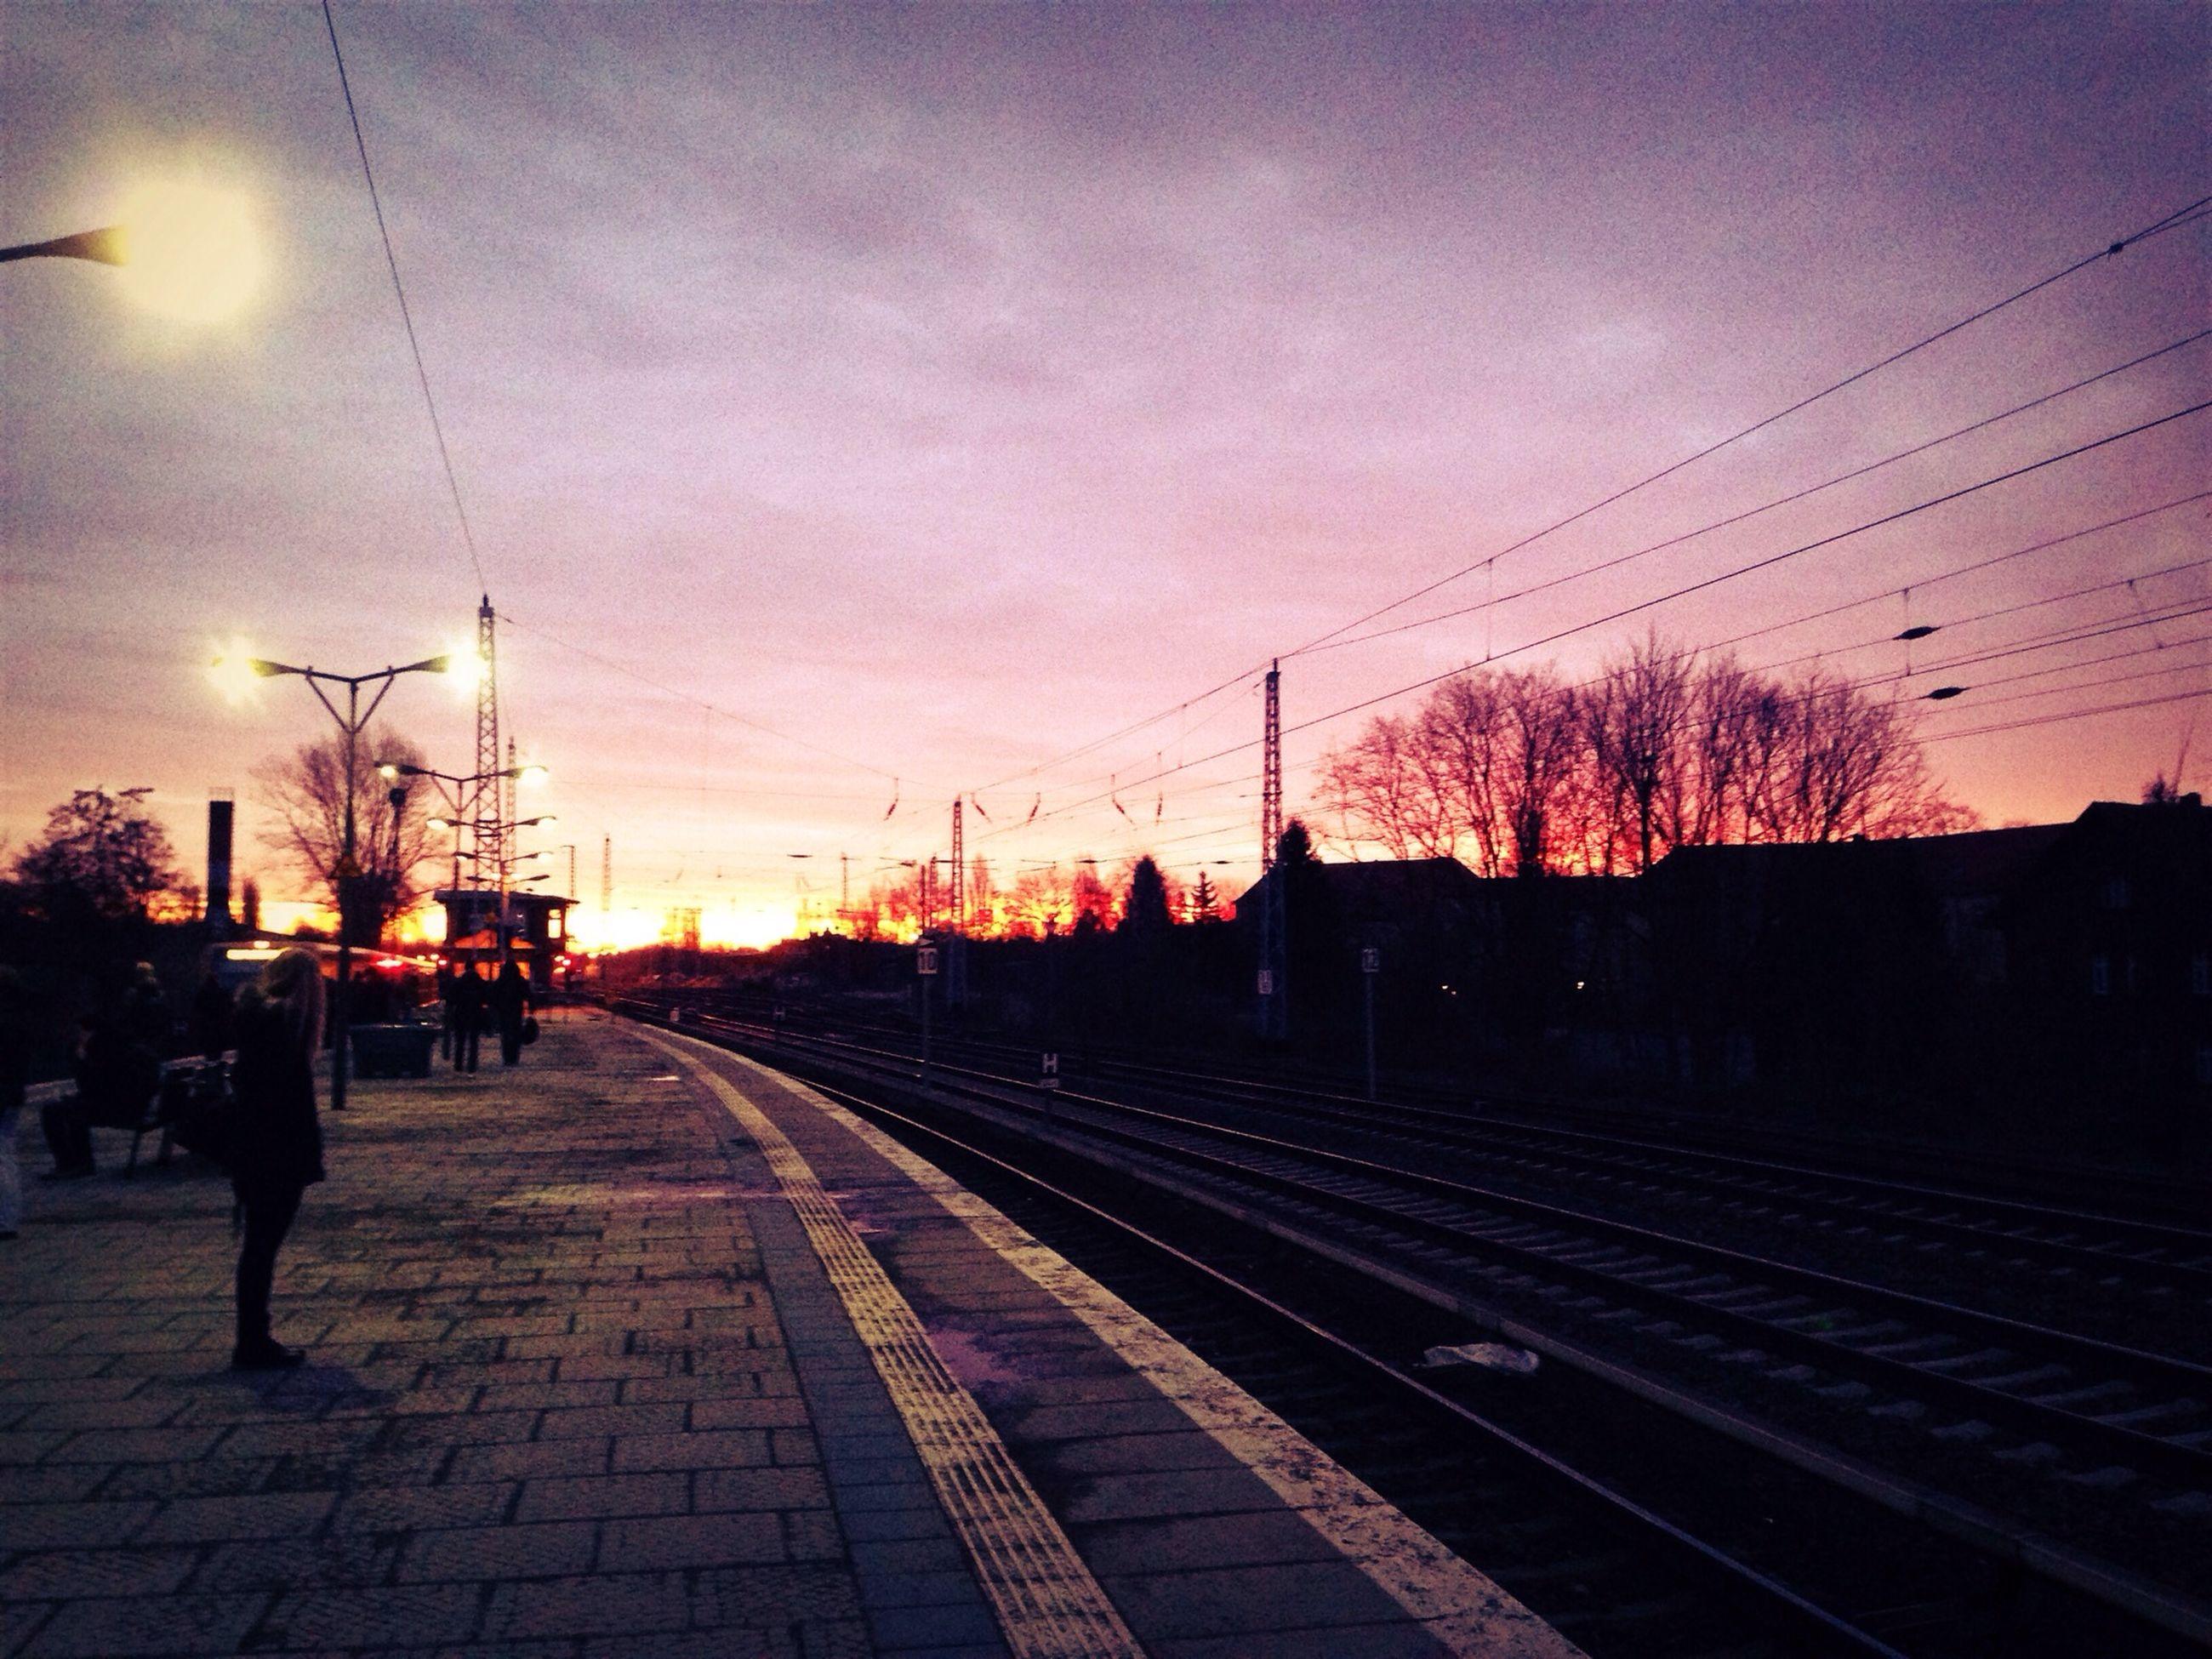 Platform at sunset